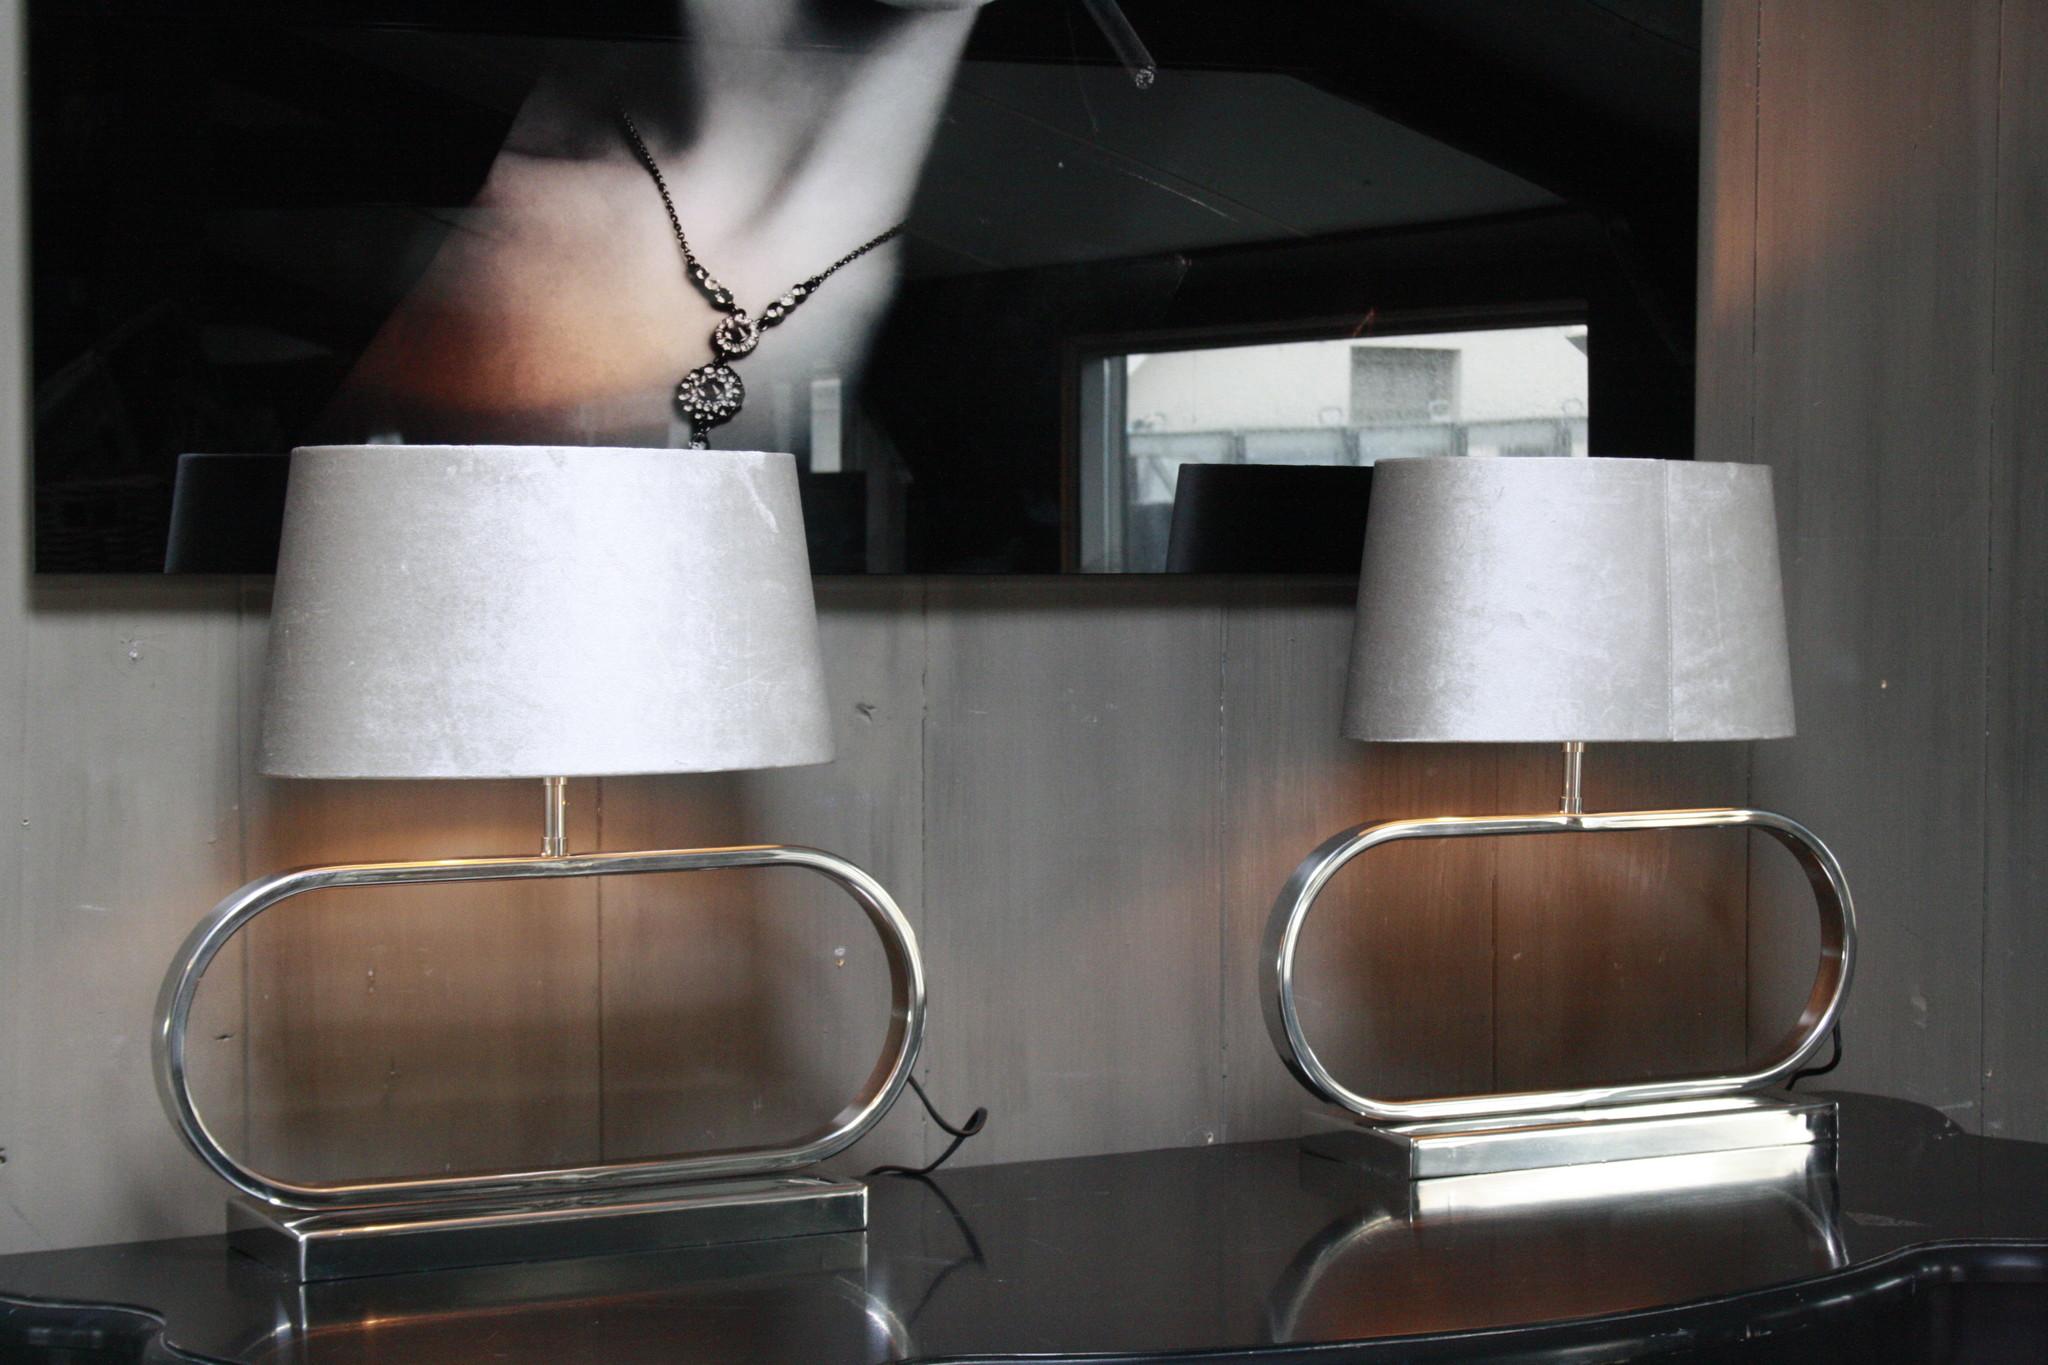 Tafellamp Ovaal RVS + Velours kap Eric Kuster Stijl-2